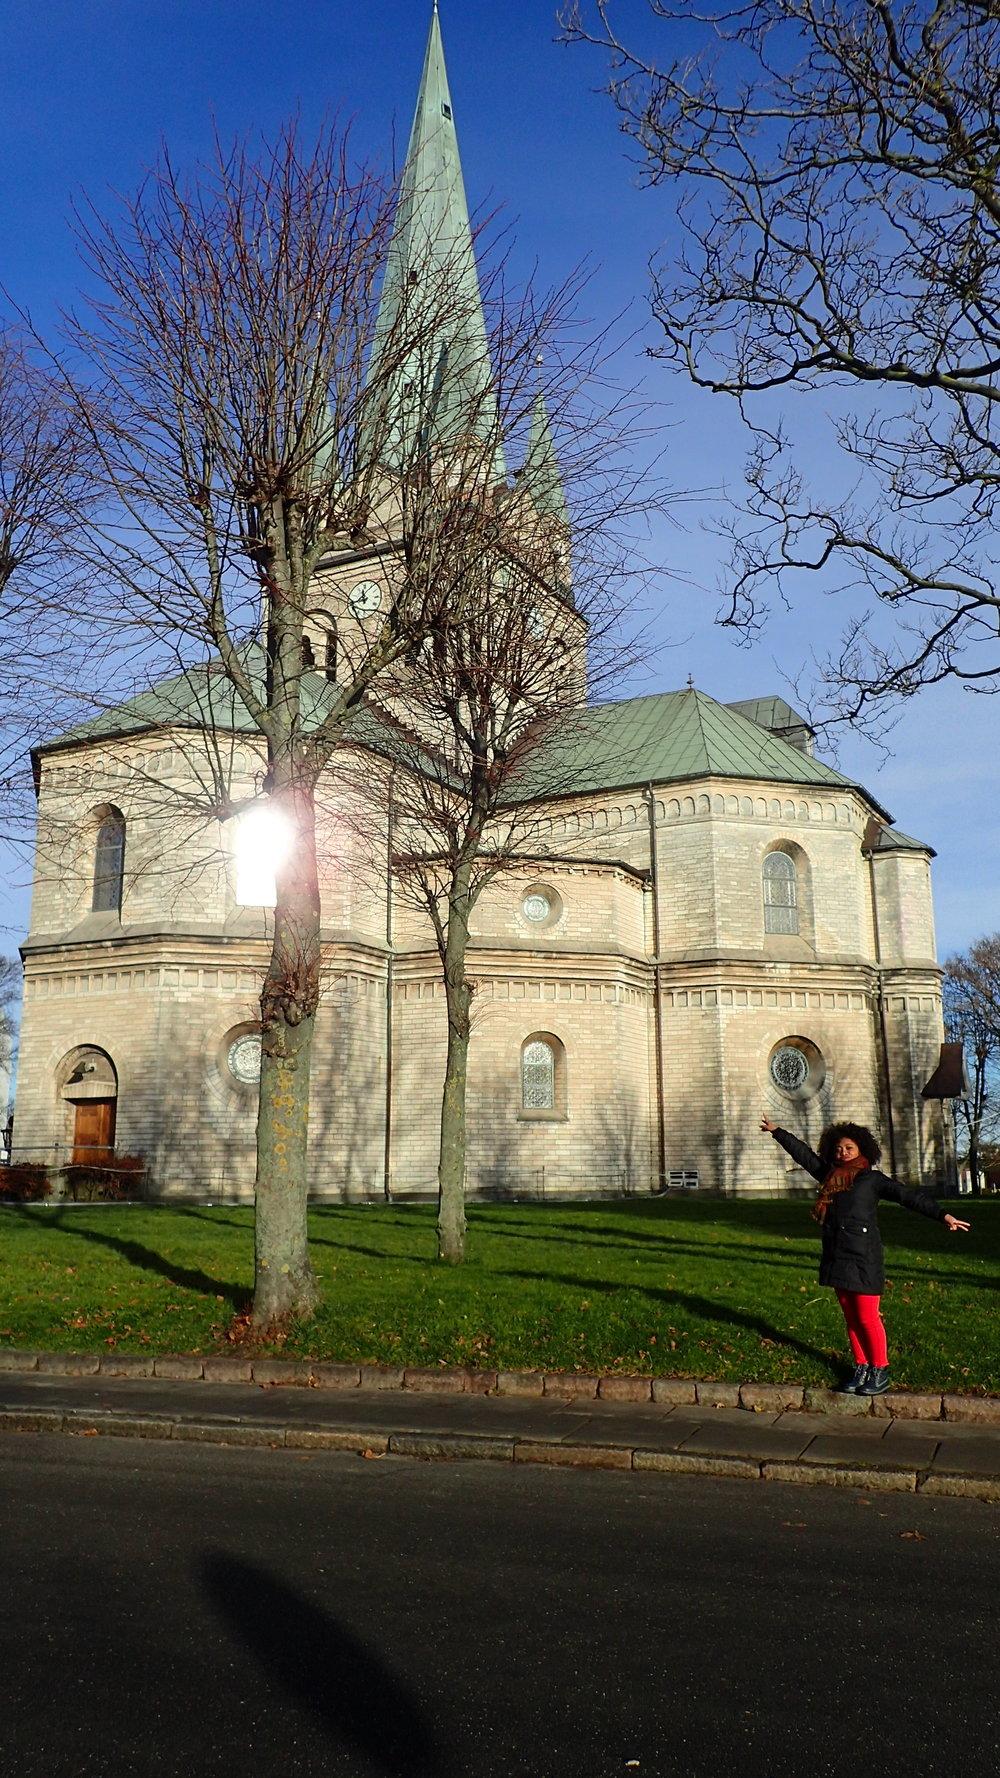 Frederikshavn Church